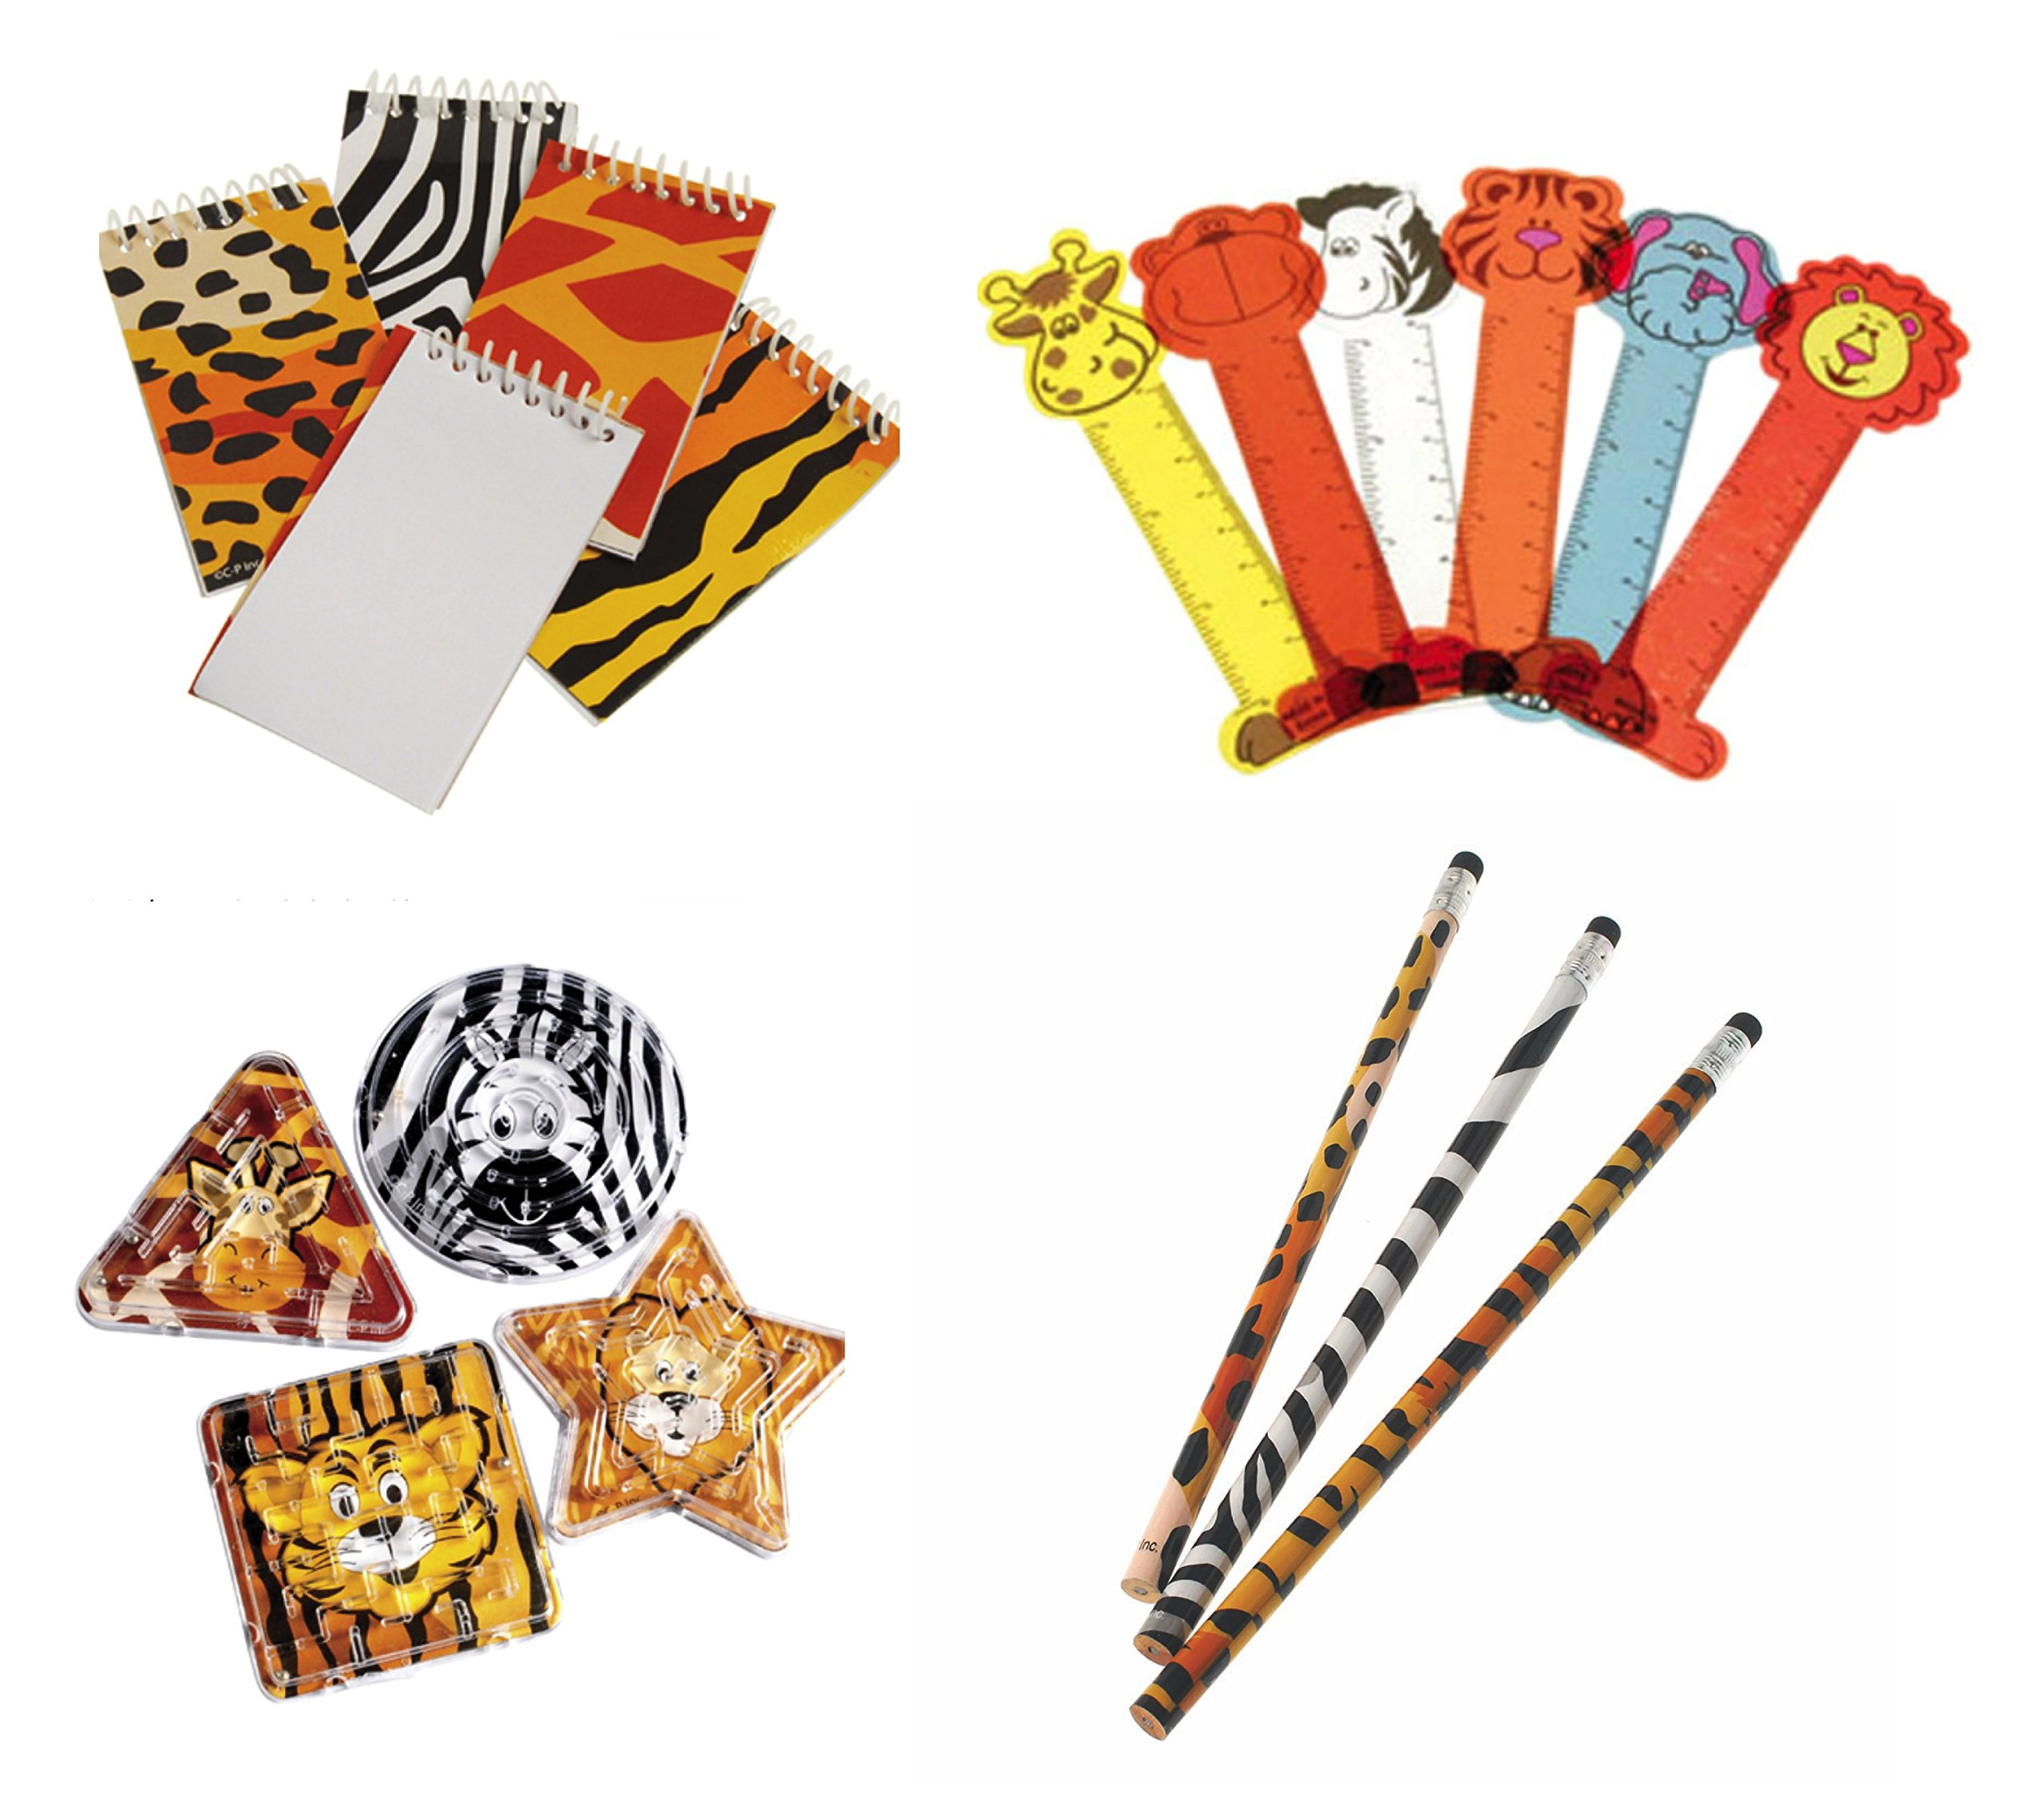 William & Douglas Animal Party Bundle | Party Favors include Maze Puzzles, Print Pencils, Ruler Bookmarks, Print Notebooks